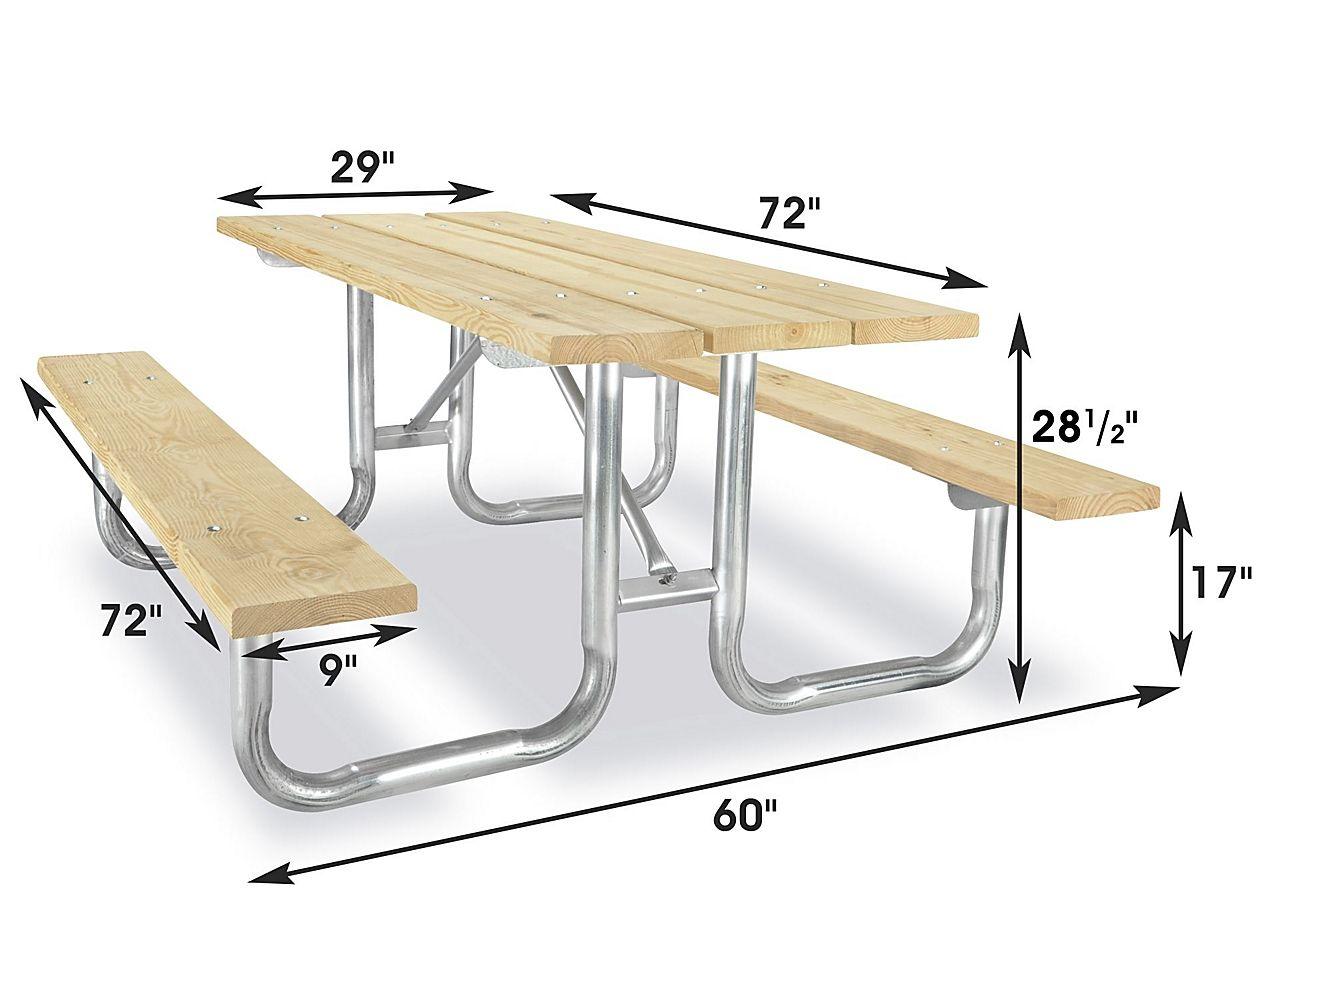 Steel Frame Pressure Treated Picnic Table 6 H 4405 Uline